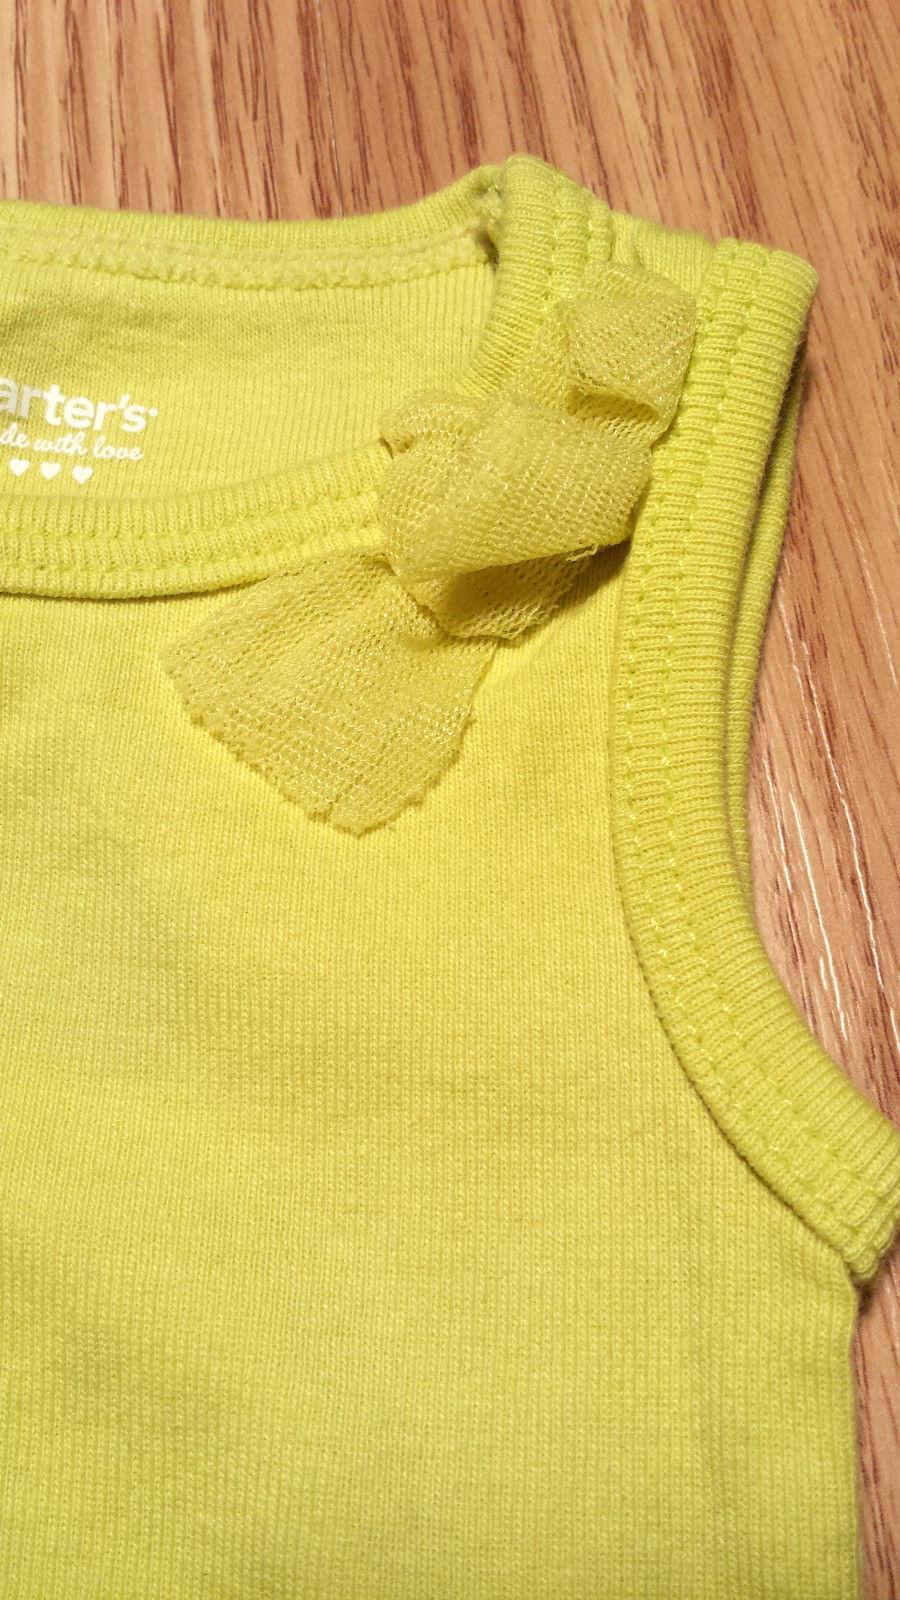 Girl's Size NB Newborn Two Piece Green Carter's Tank Top W/ Bow & Plaid Skirt